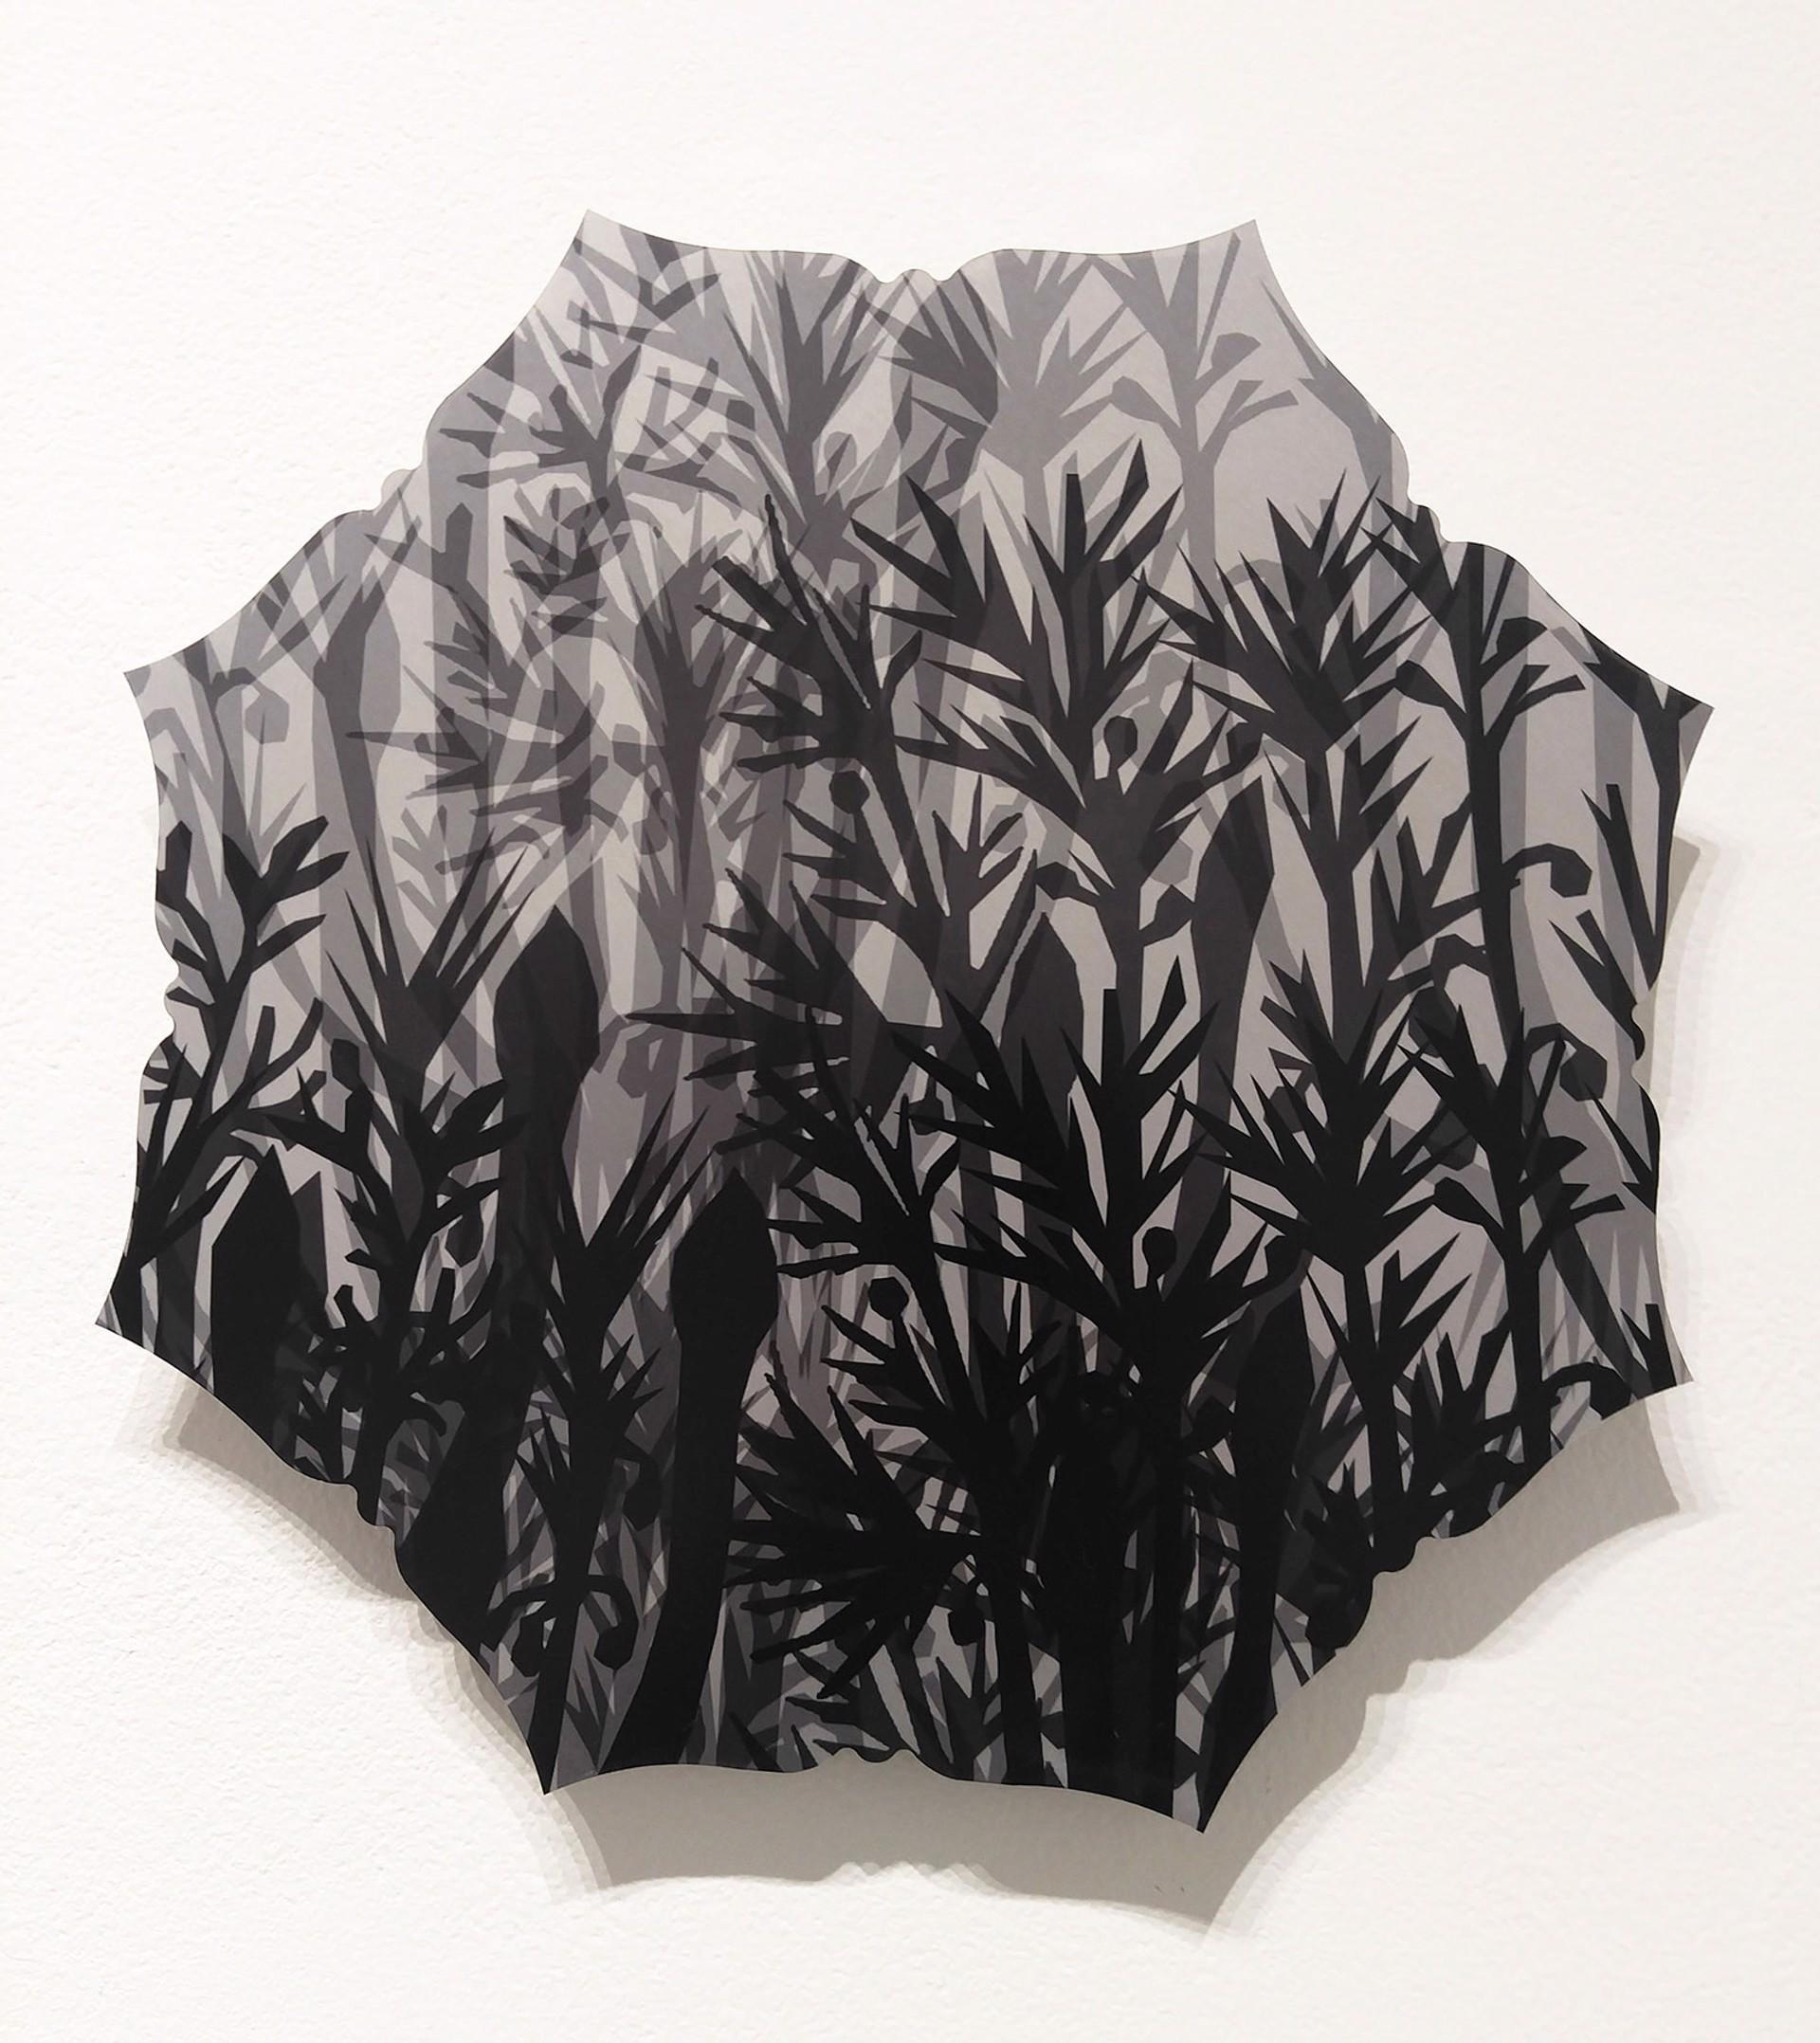 Asparagus by Pantea Karimi